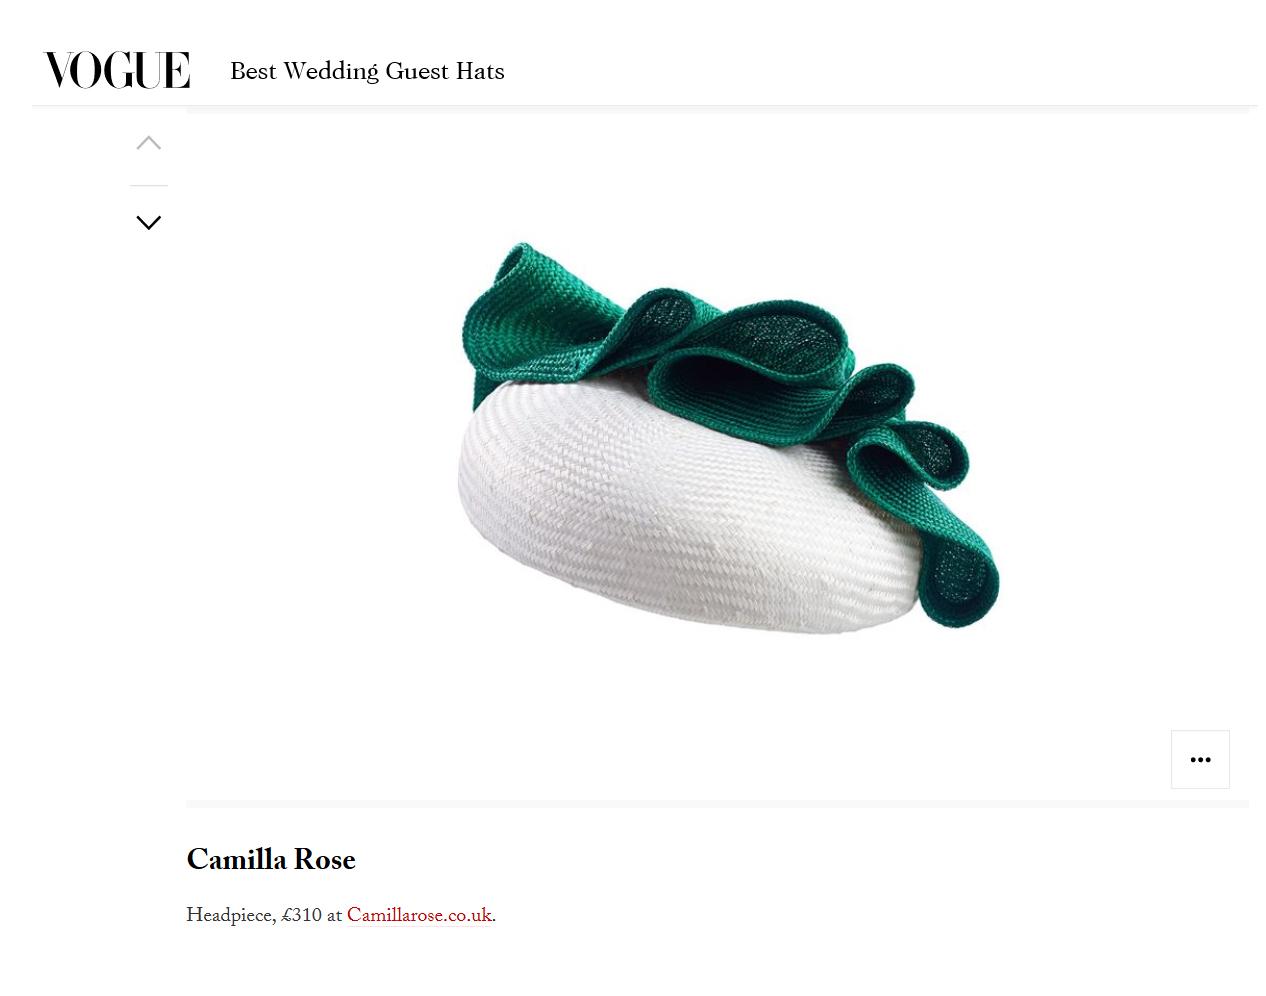 Vogue.co.uk - 29th April 2017  (Rake Headpiece)